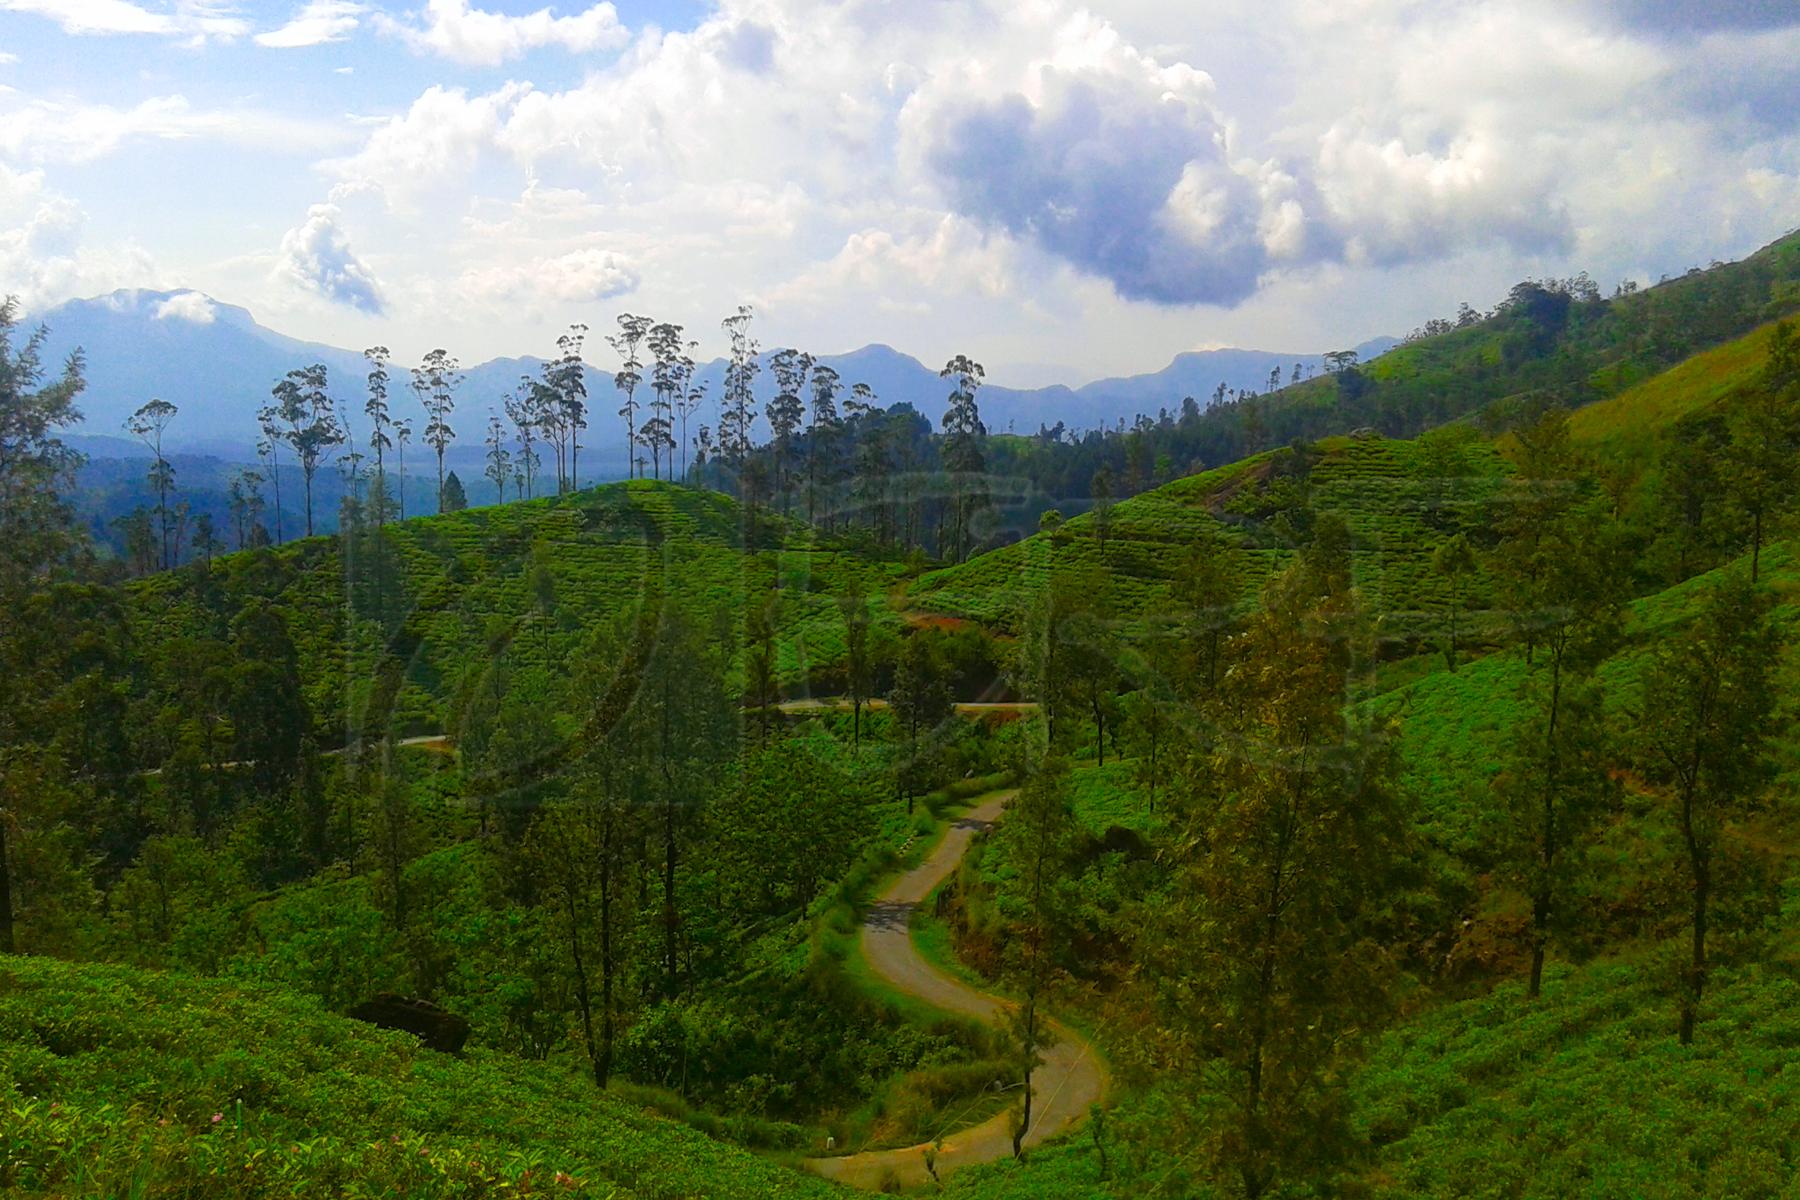 Hill country landscape in Sri Lanka